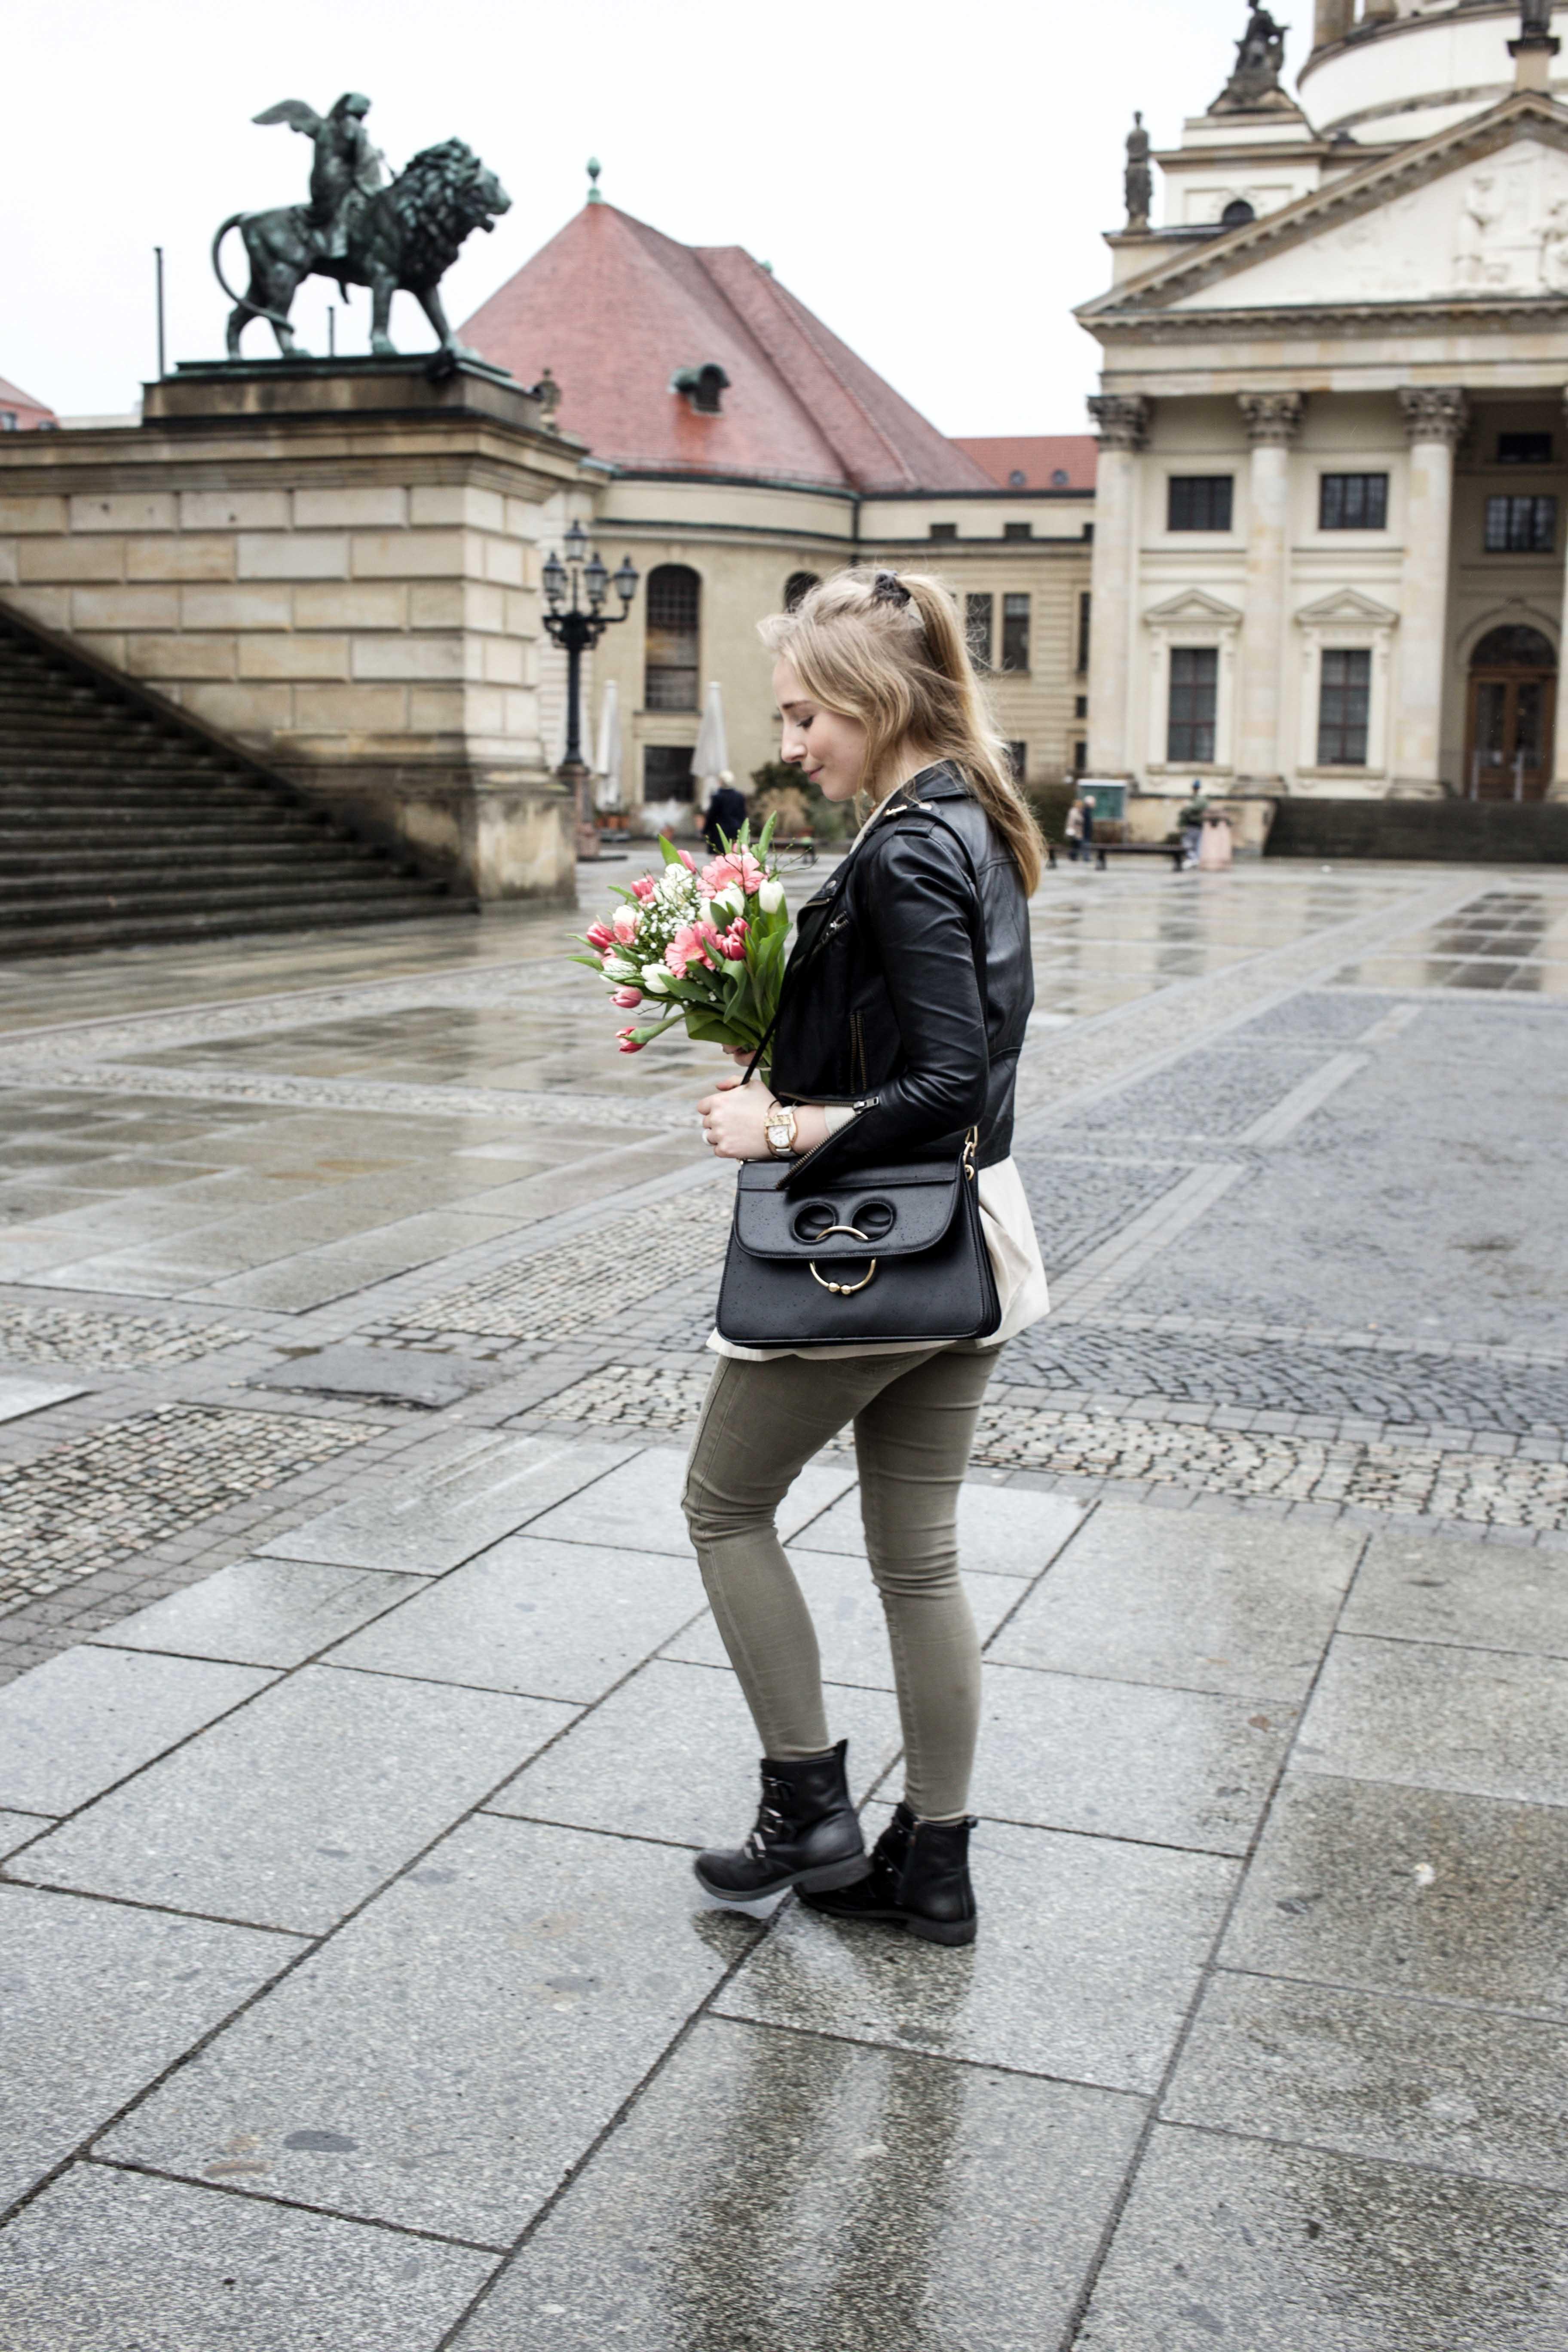 grüne-biker-jeans-geburtstags-outfit-lederjacke-berlin-gendarmenmarkt-modeblogger-fashionblog_0456